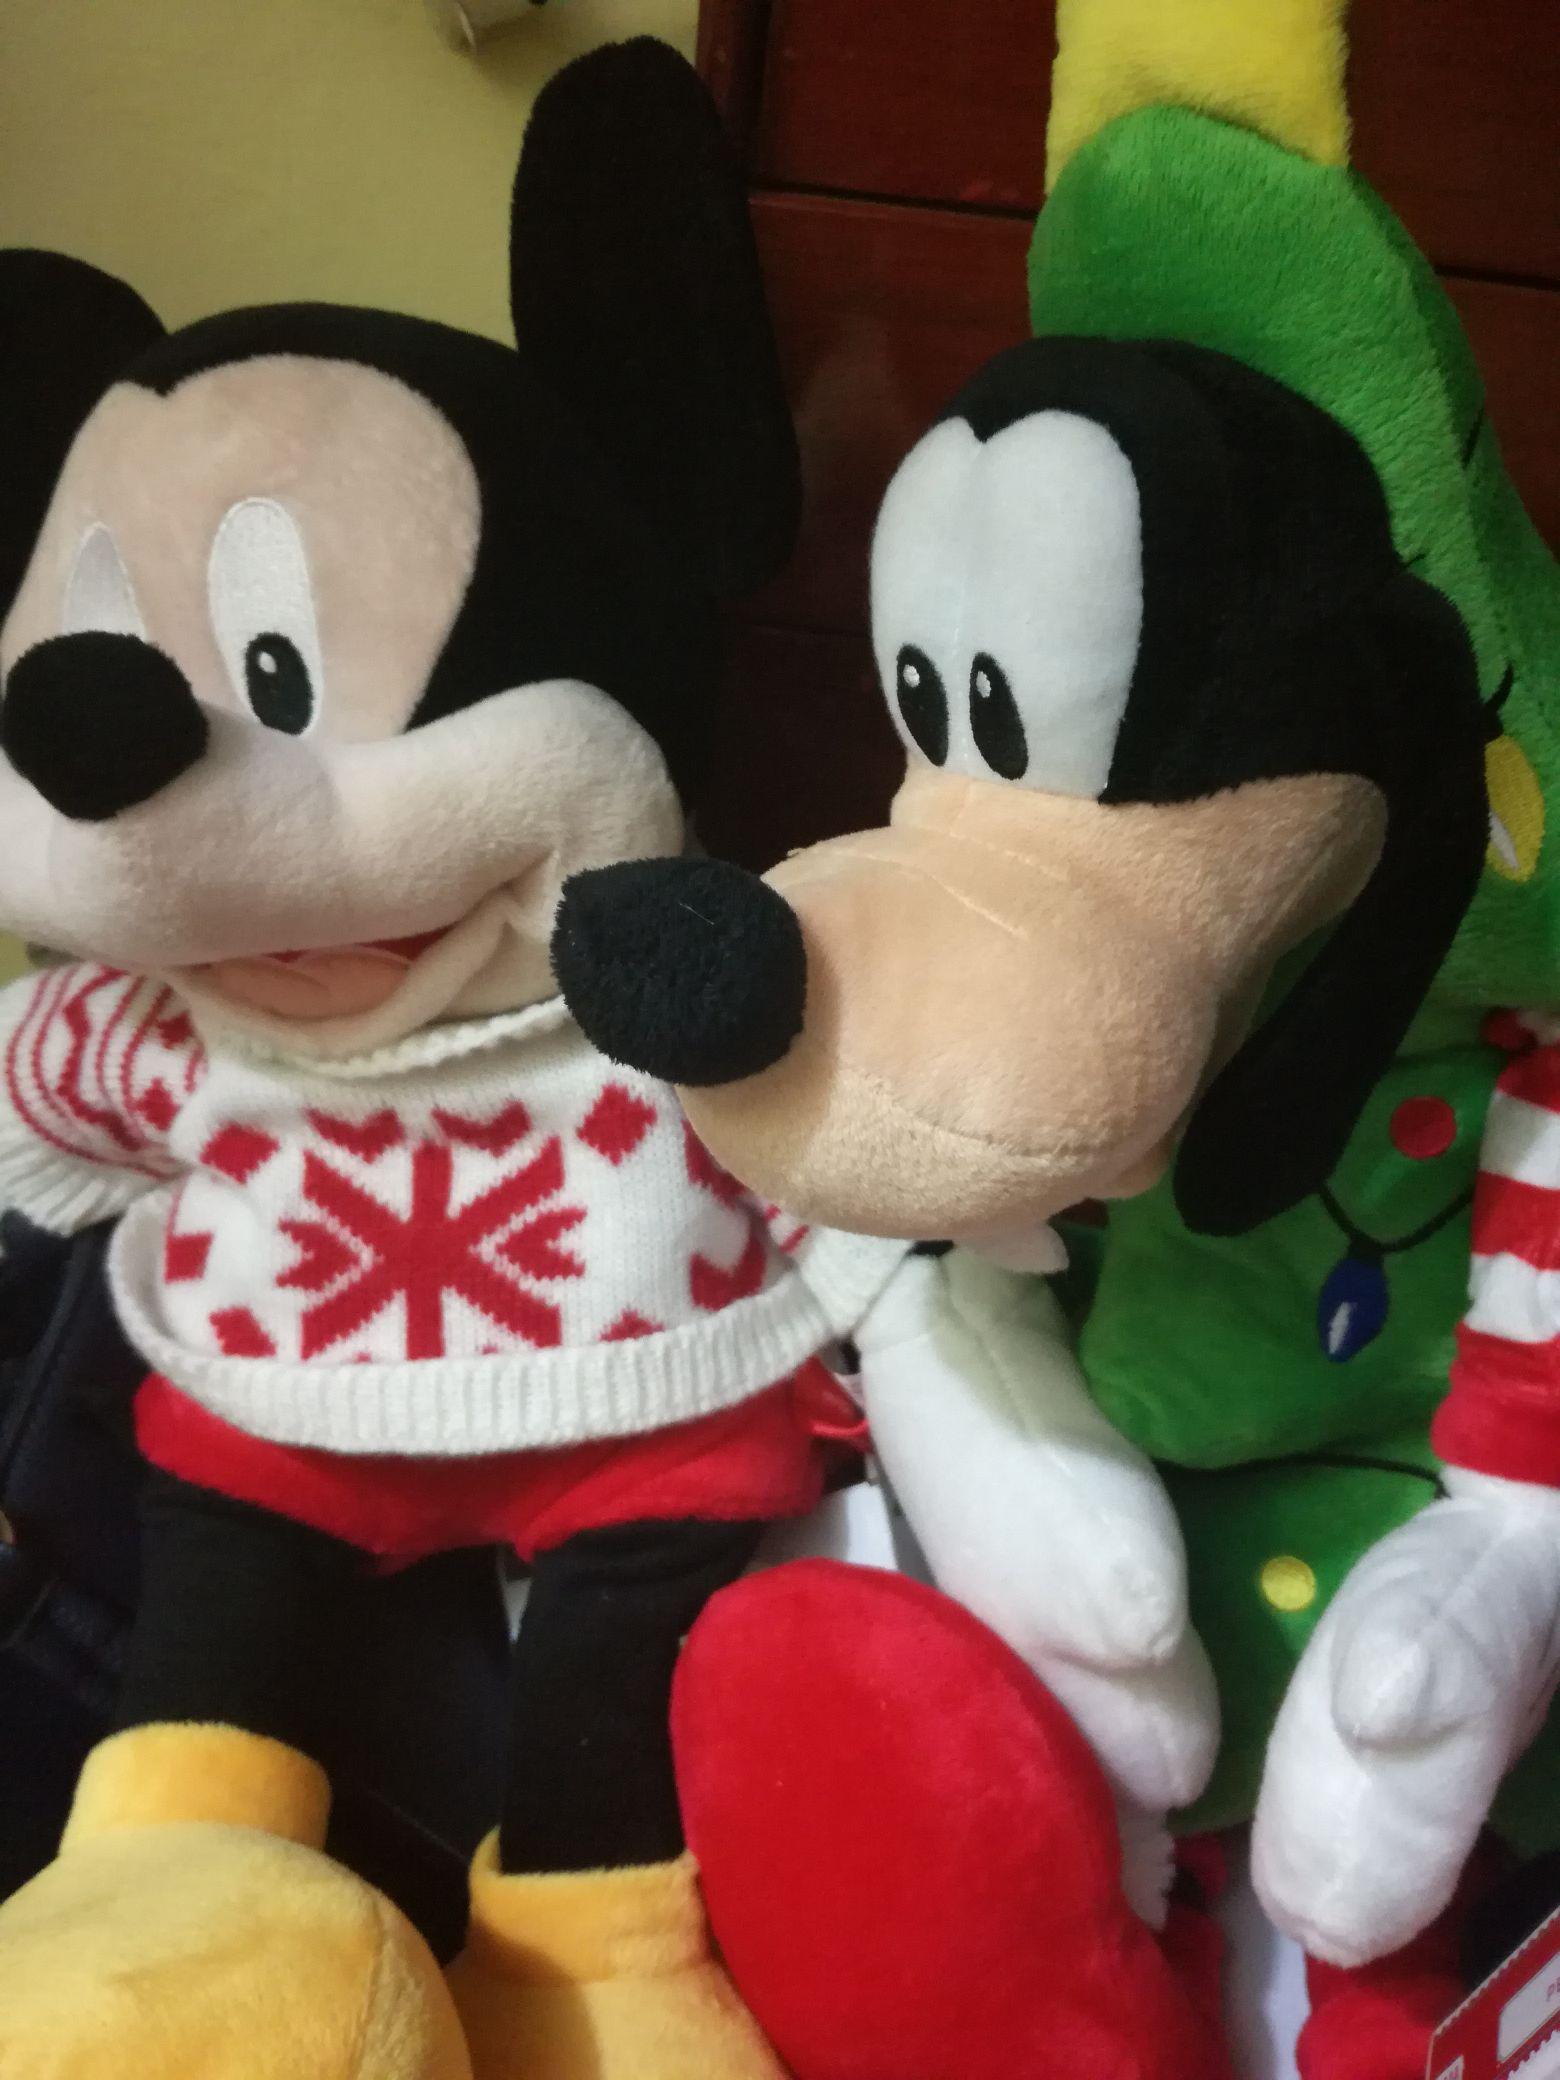 Walmart Veracruz: Regalos navideños como mickey mouse ,goofy,pinguino inflable $.01